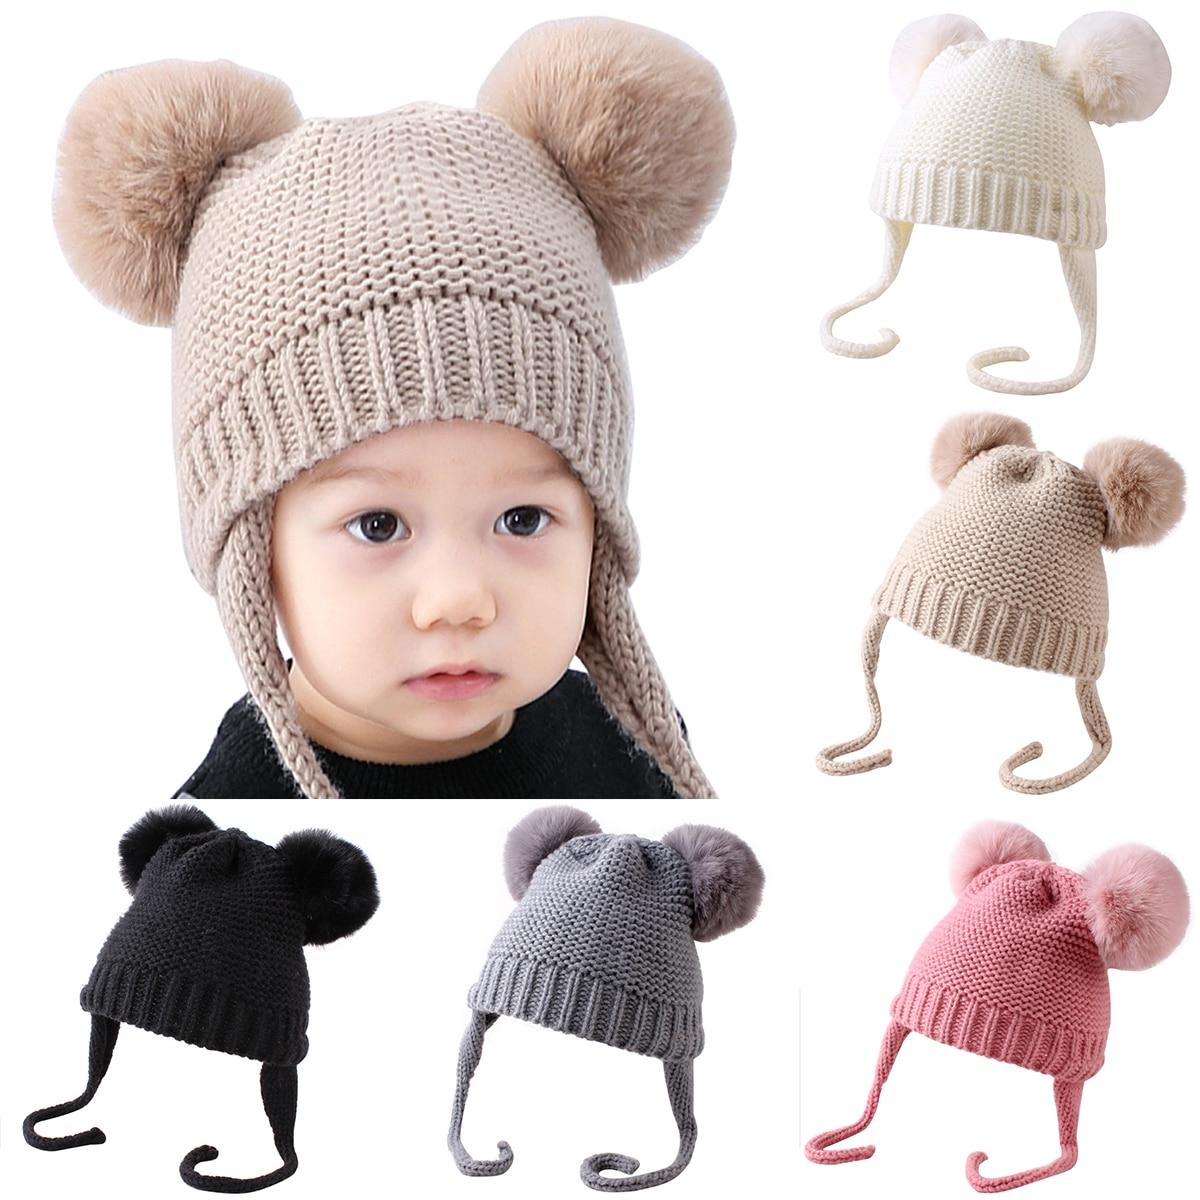 Cute Toddler Kids Girl/&Boy Baby Infant Winter Warm Crochet Knit Hat Beanie Cap